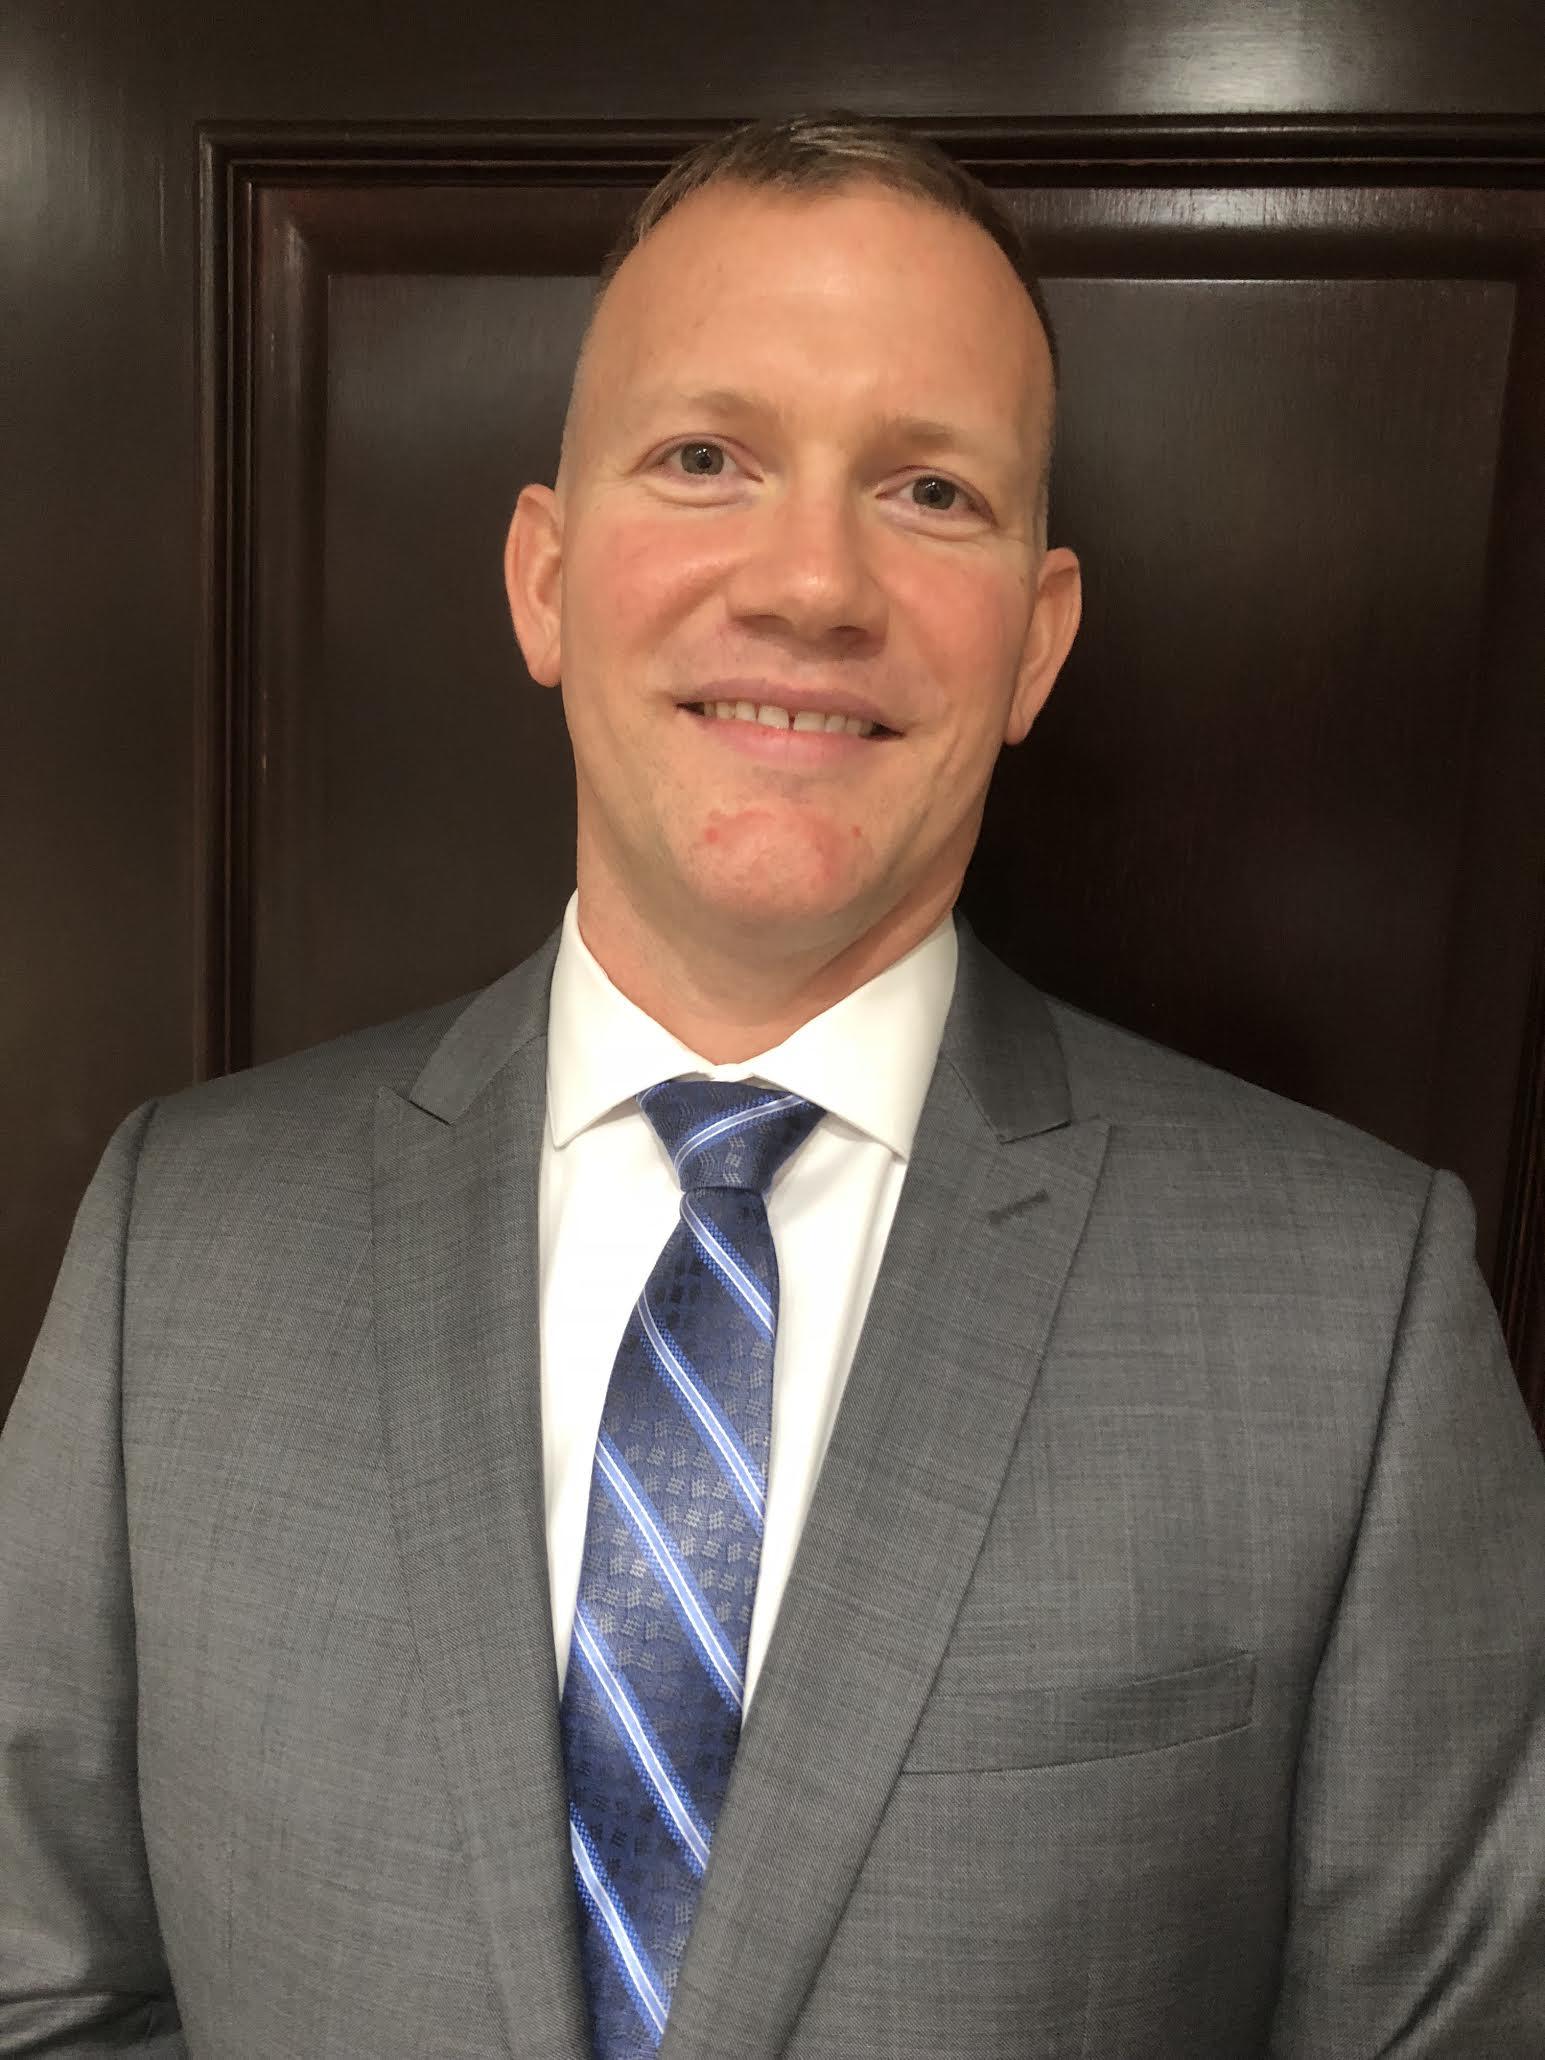 Sean J. Eaton - SeanE@NicklausLaw.com